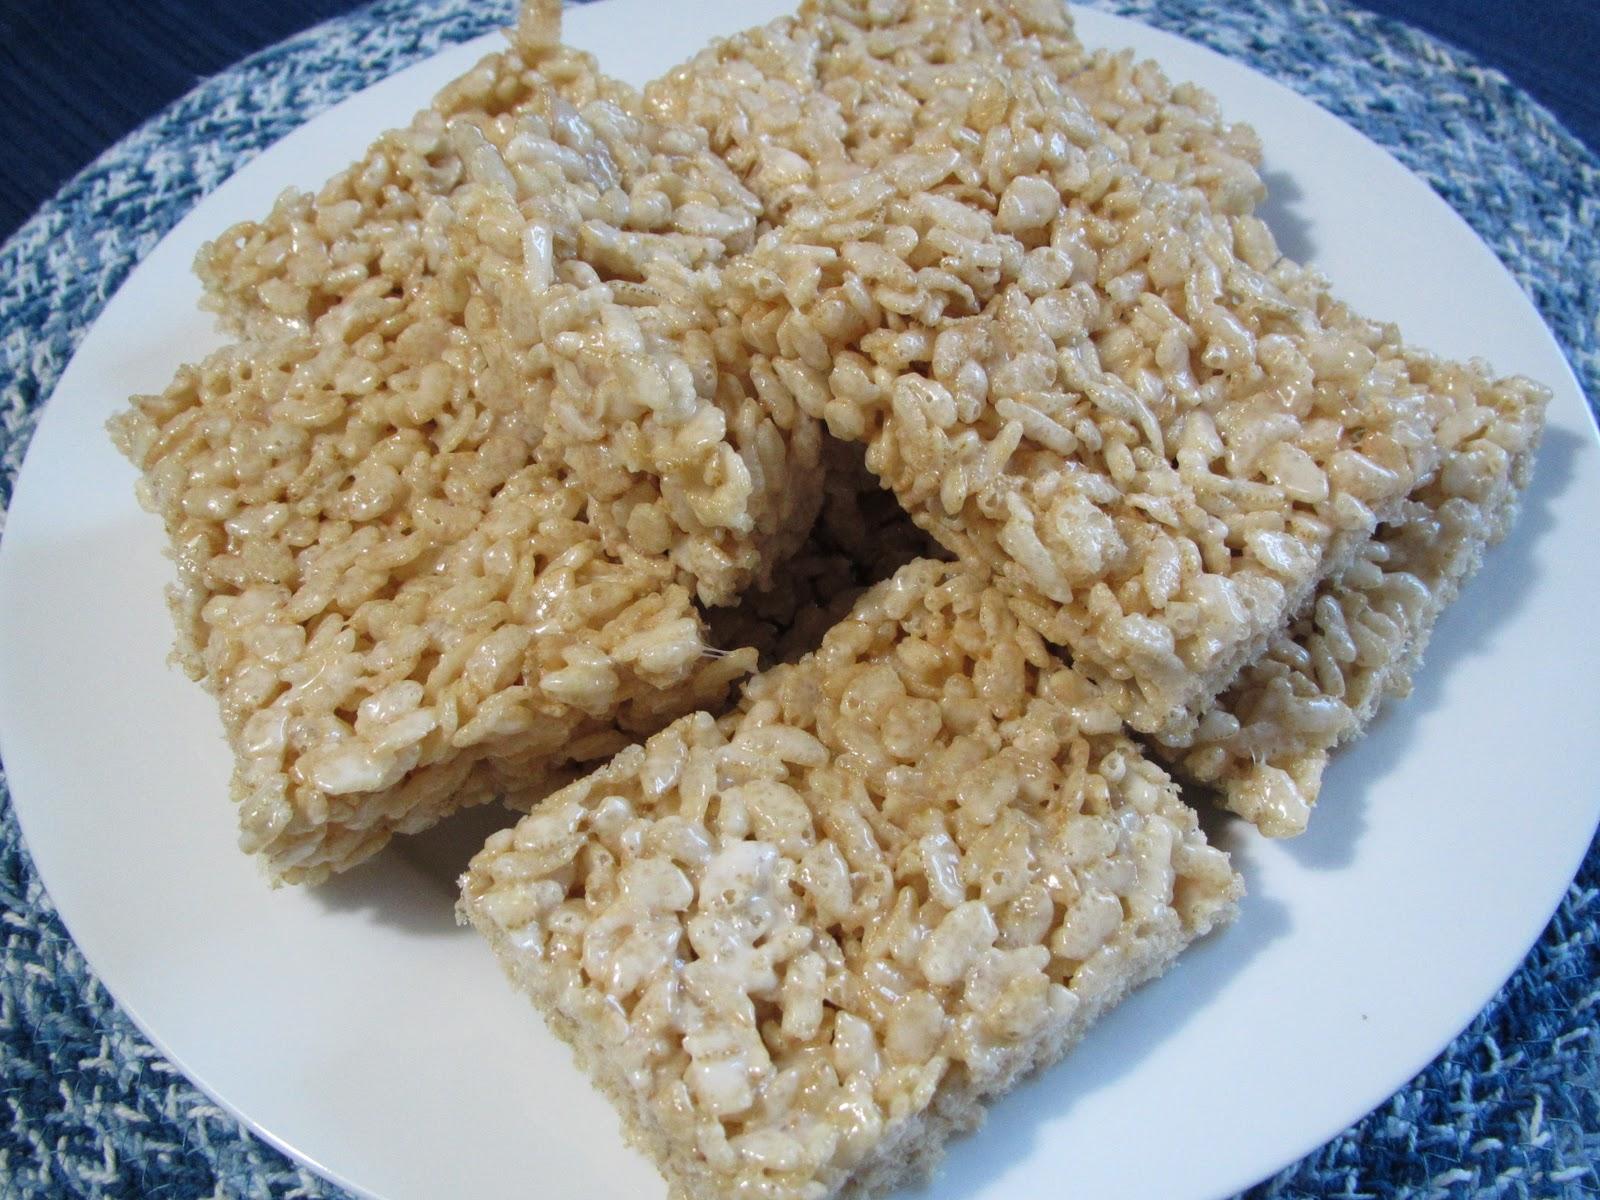 : Gluten Free Rice Krispies and Rice Krispies Treats | Gluten Free ...